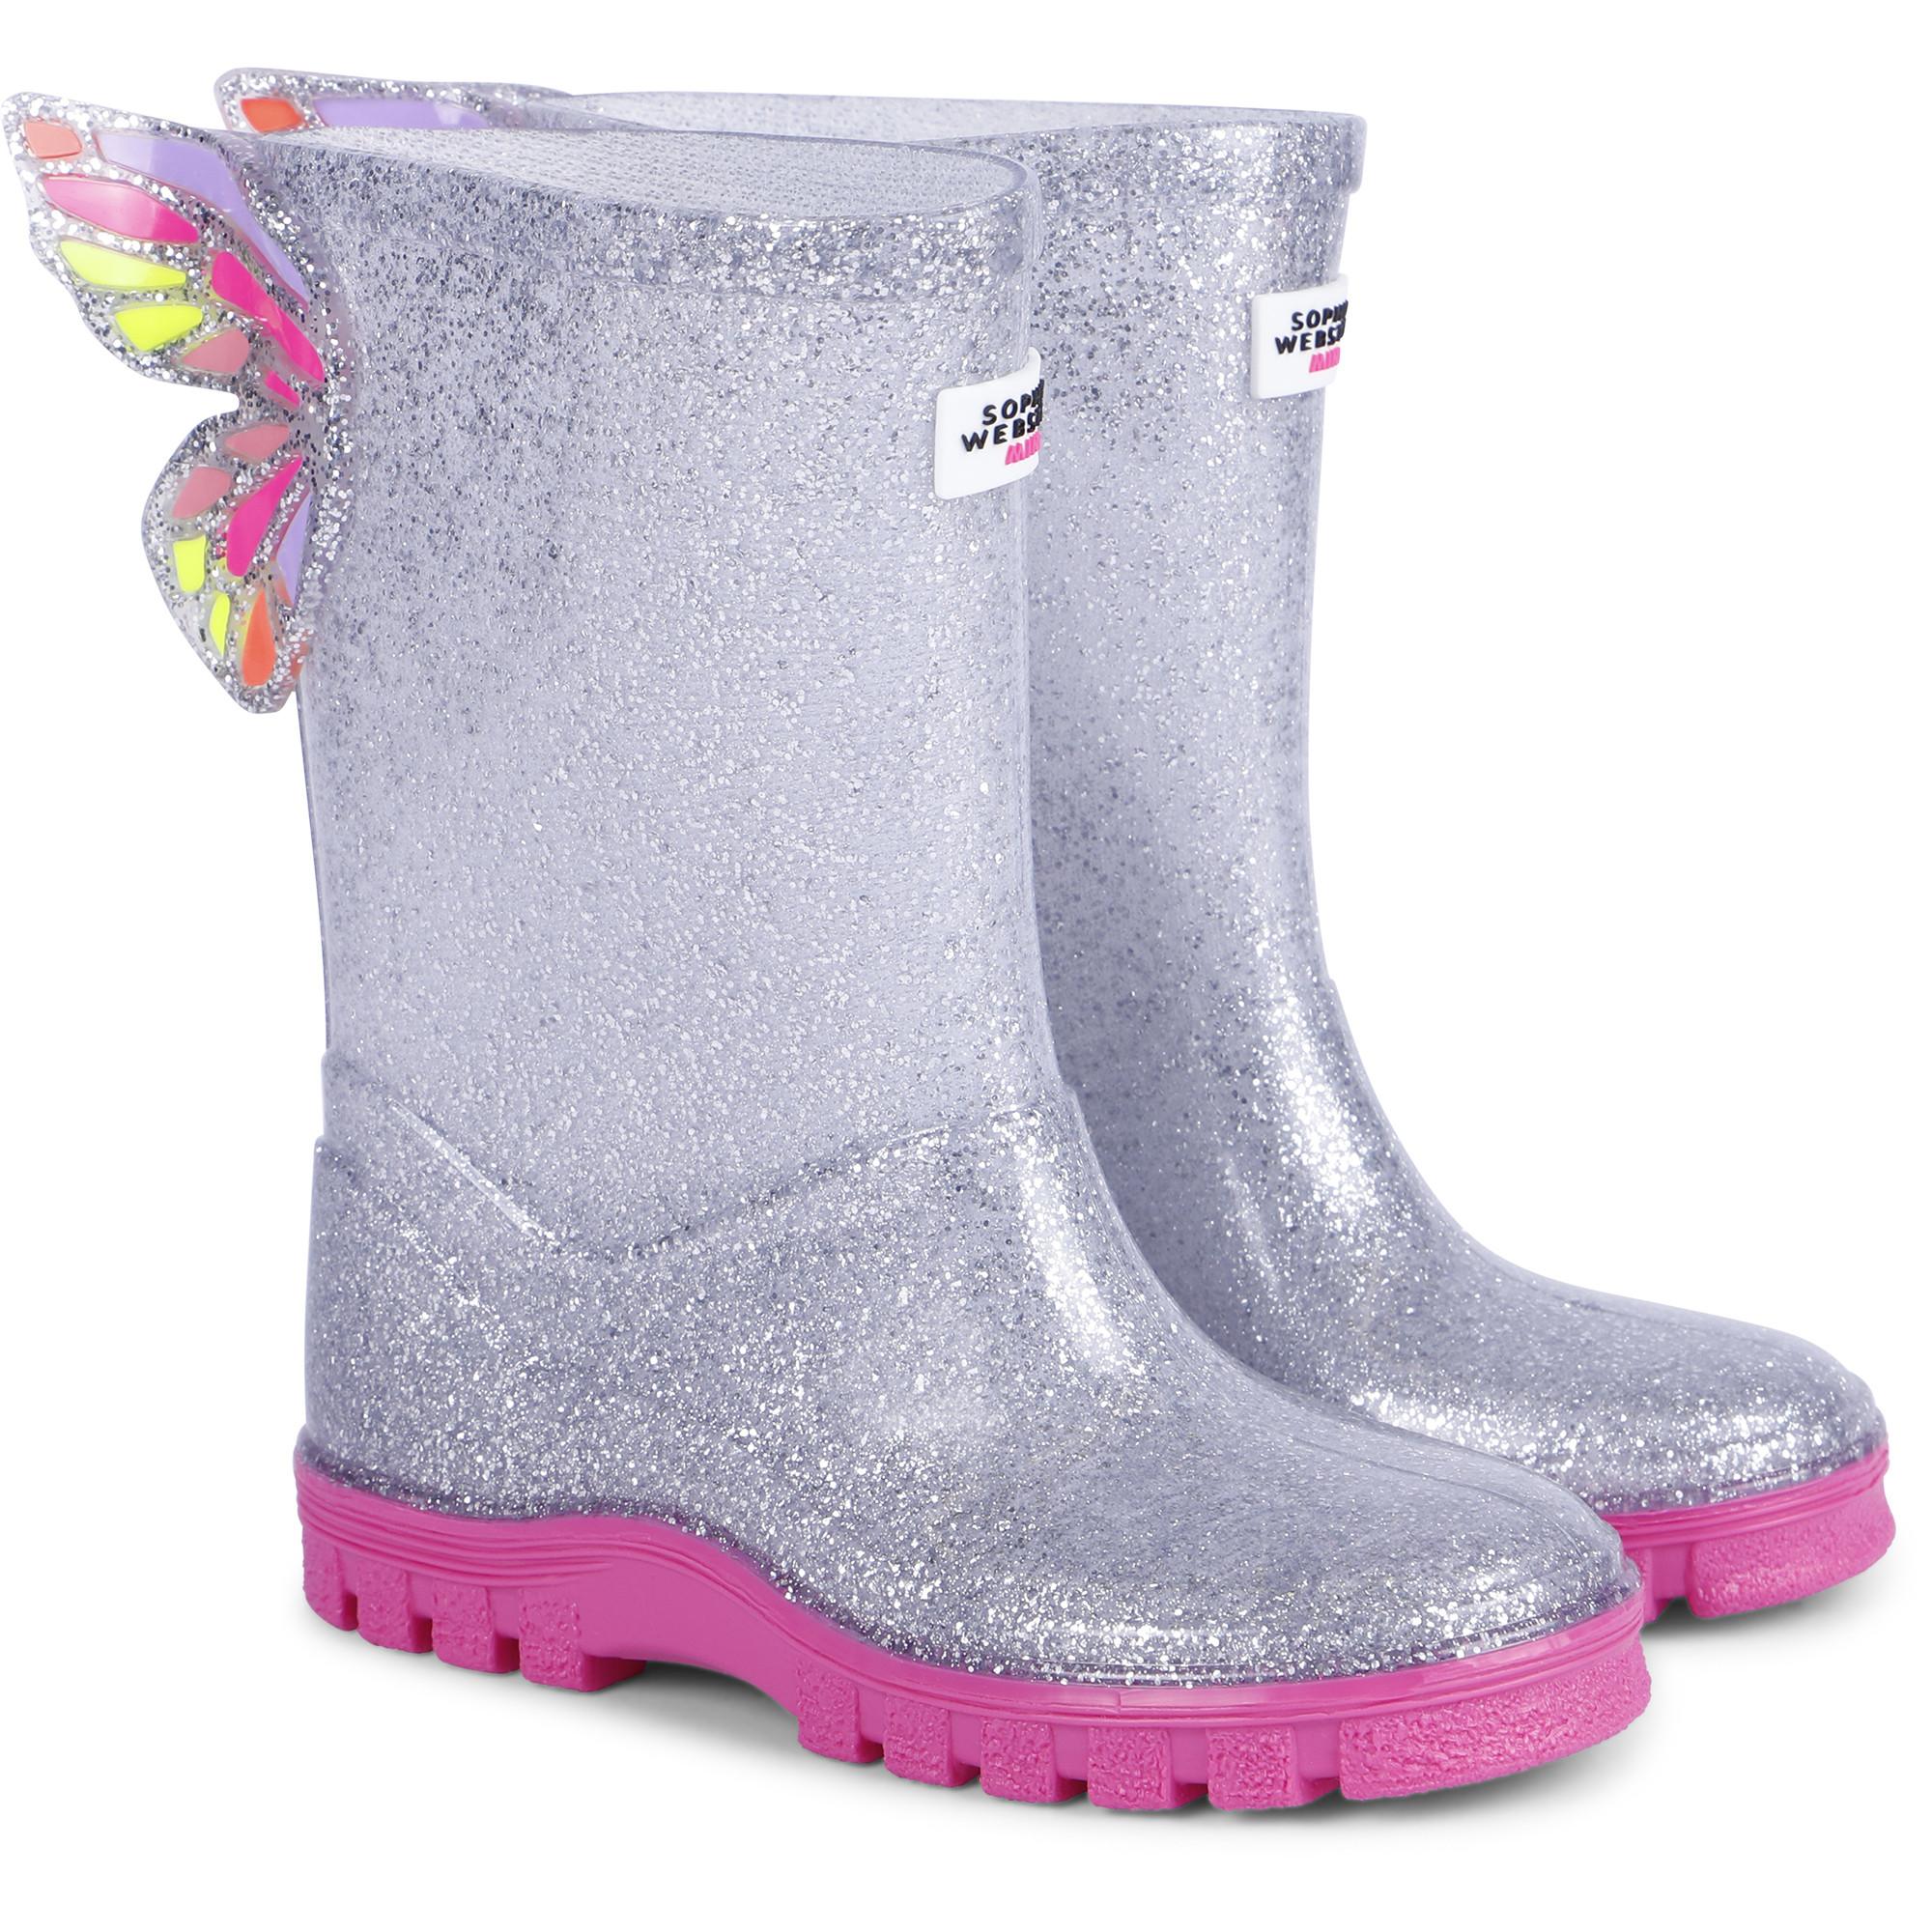 Kids Girls Boys 3D Designe Rain Snow Wellies Wellington Boots NEW